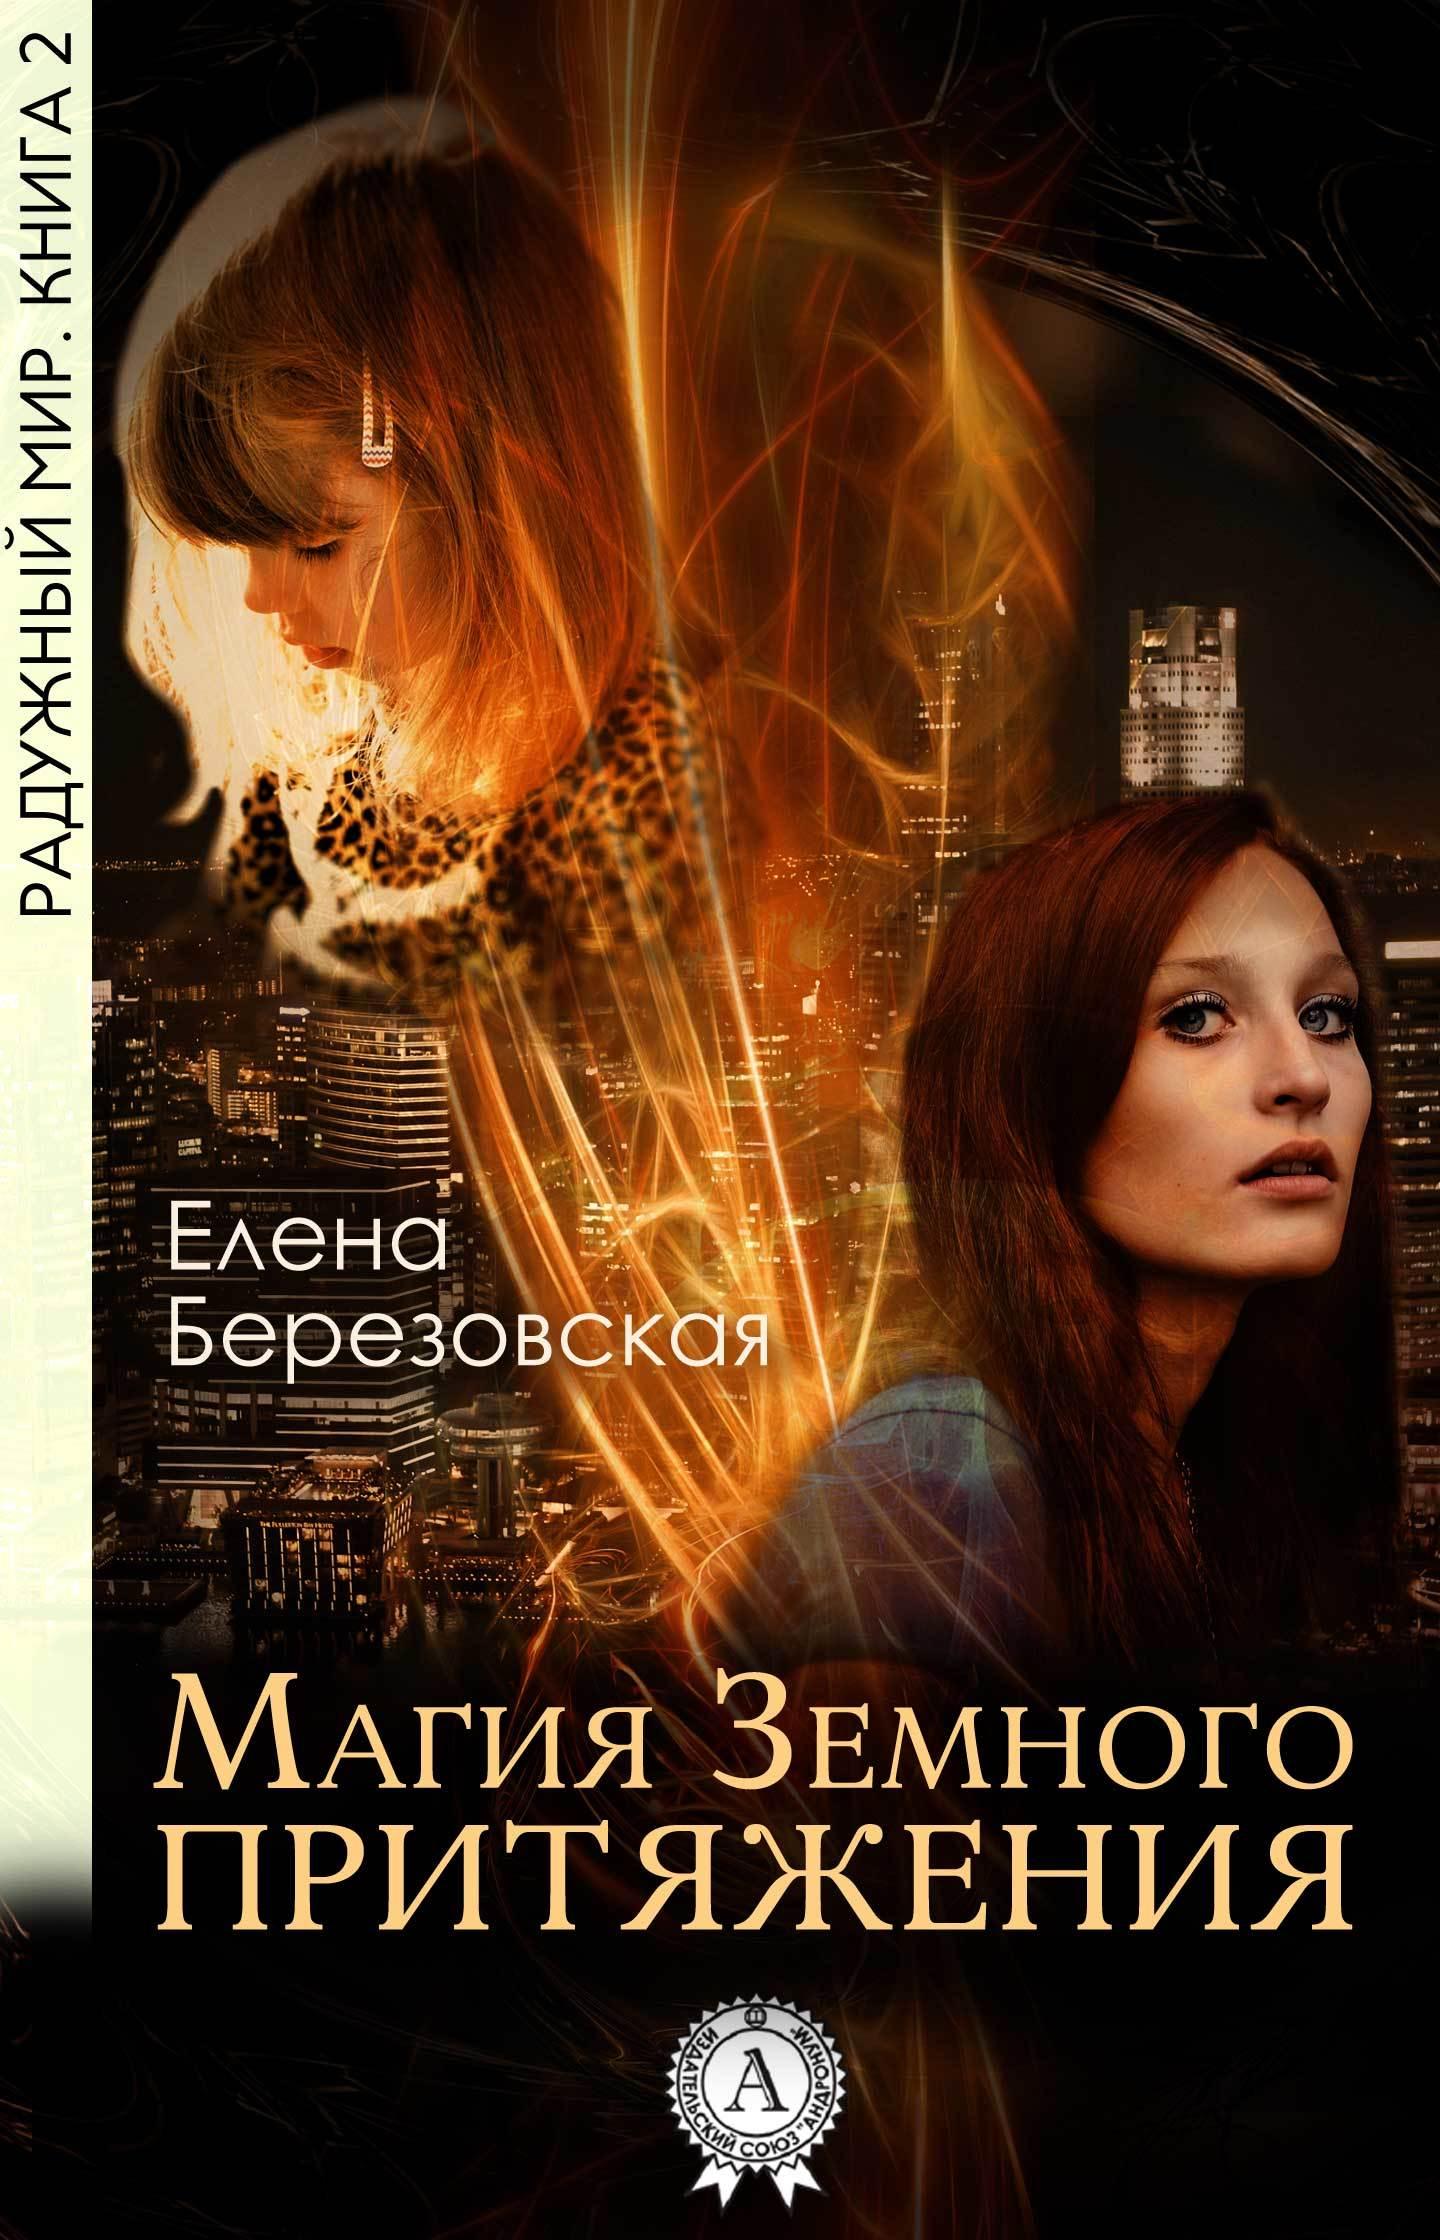 цена на Елена Березовская Магия земного притяжения